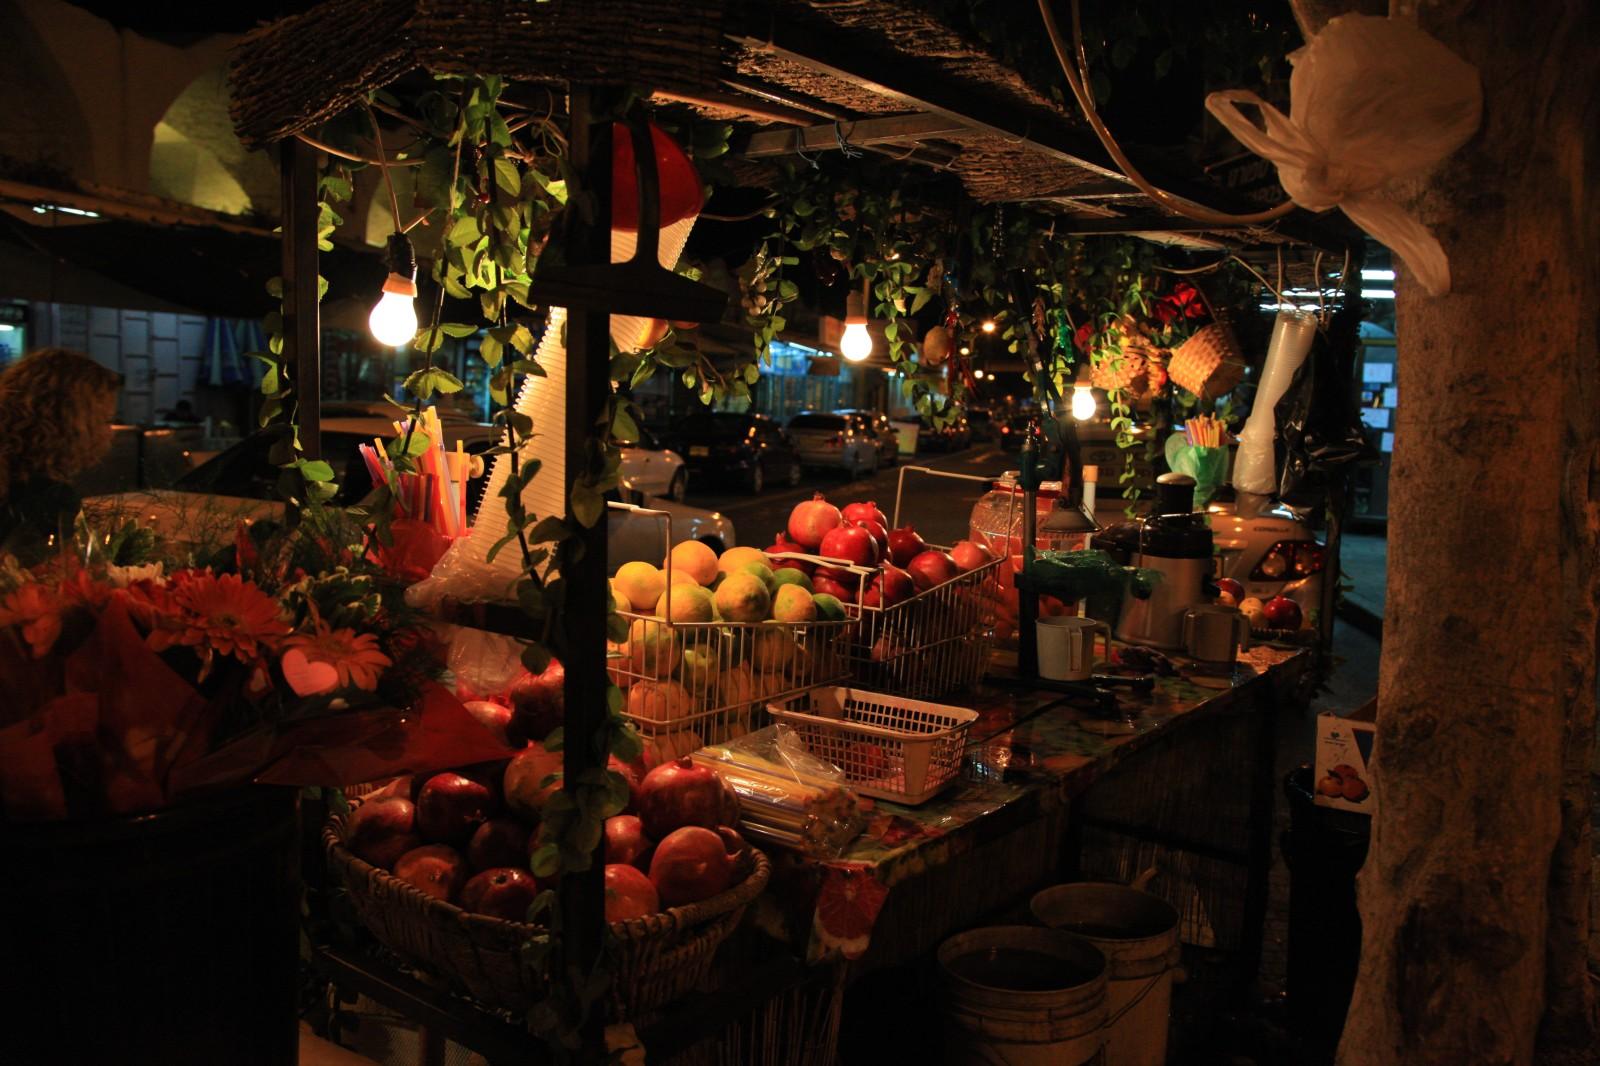 Market in Akko - an Arabic city